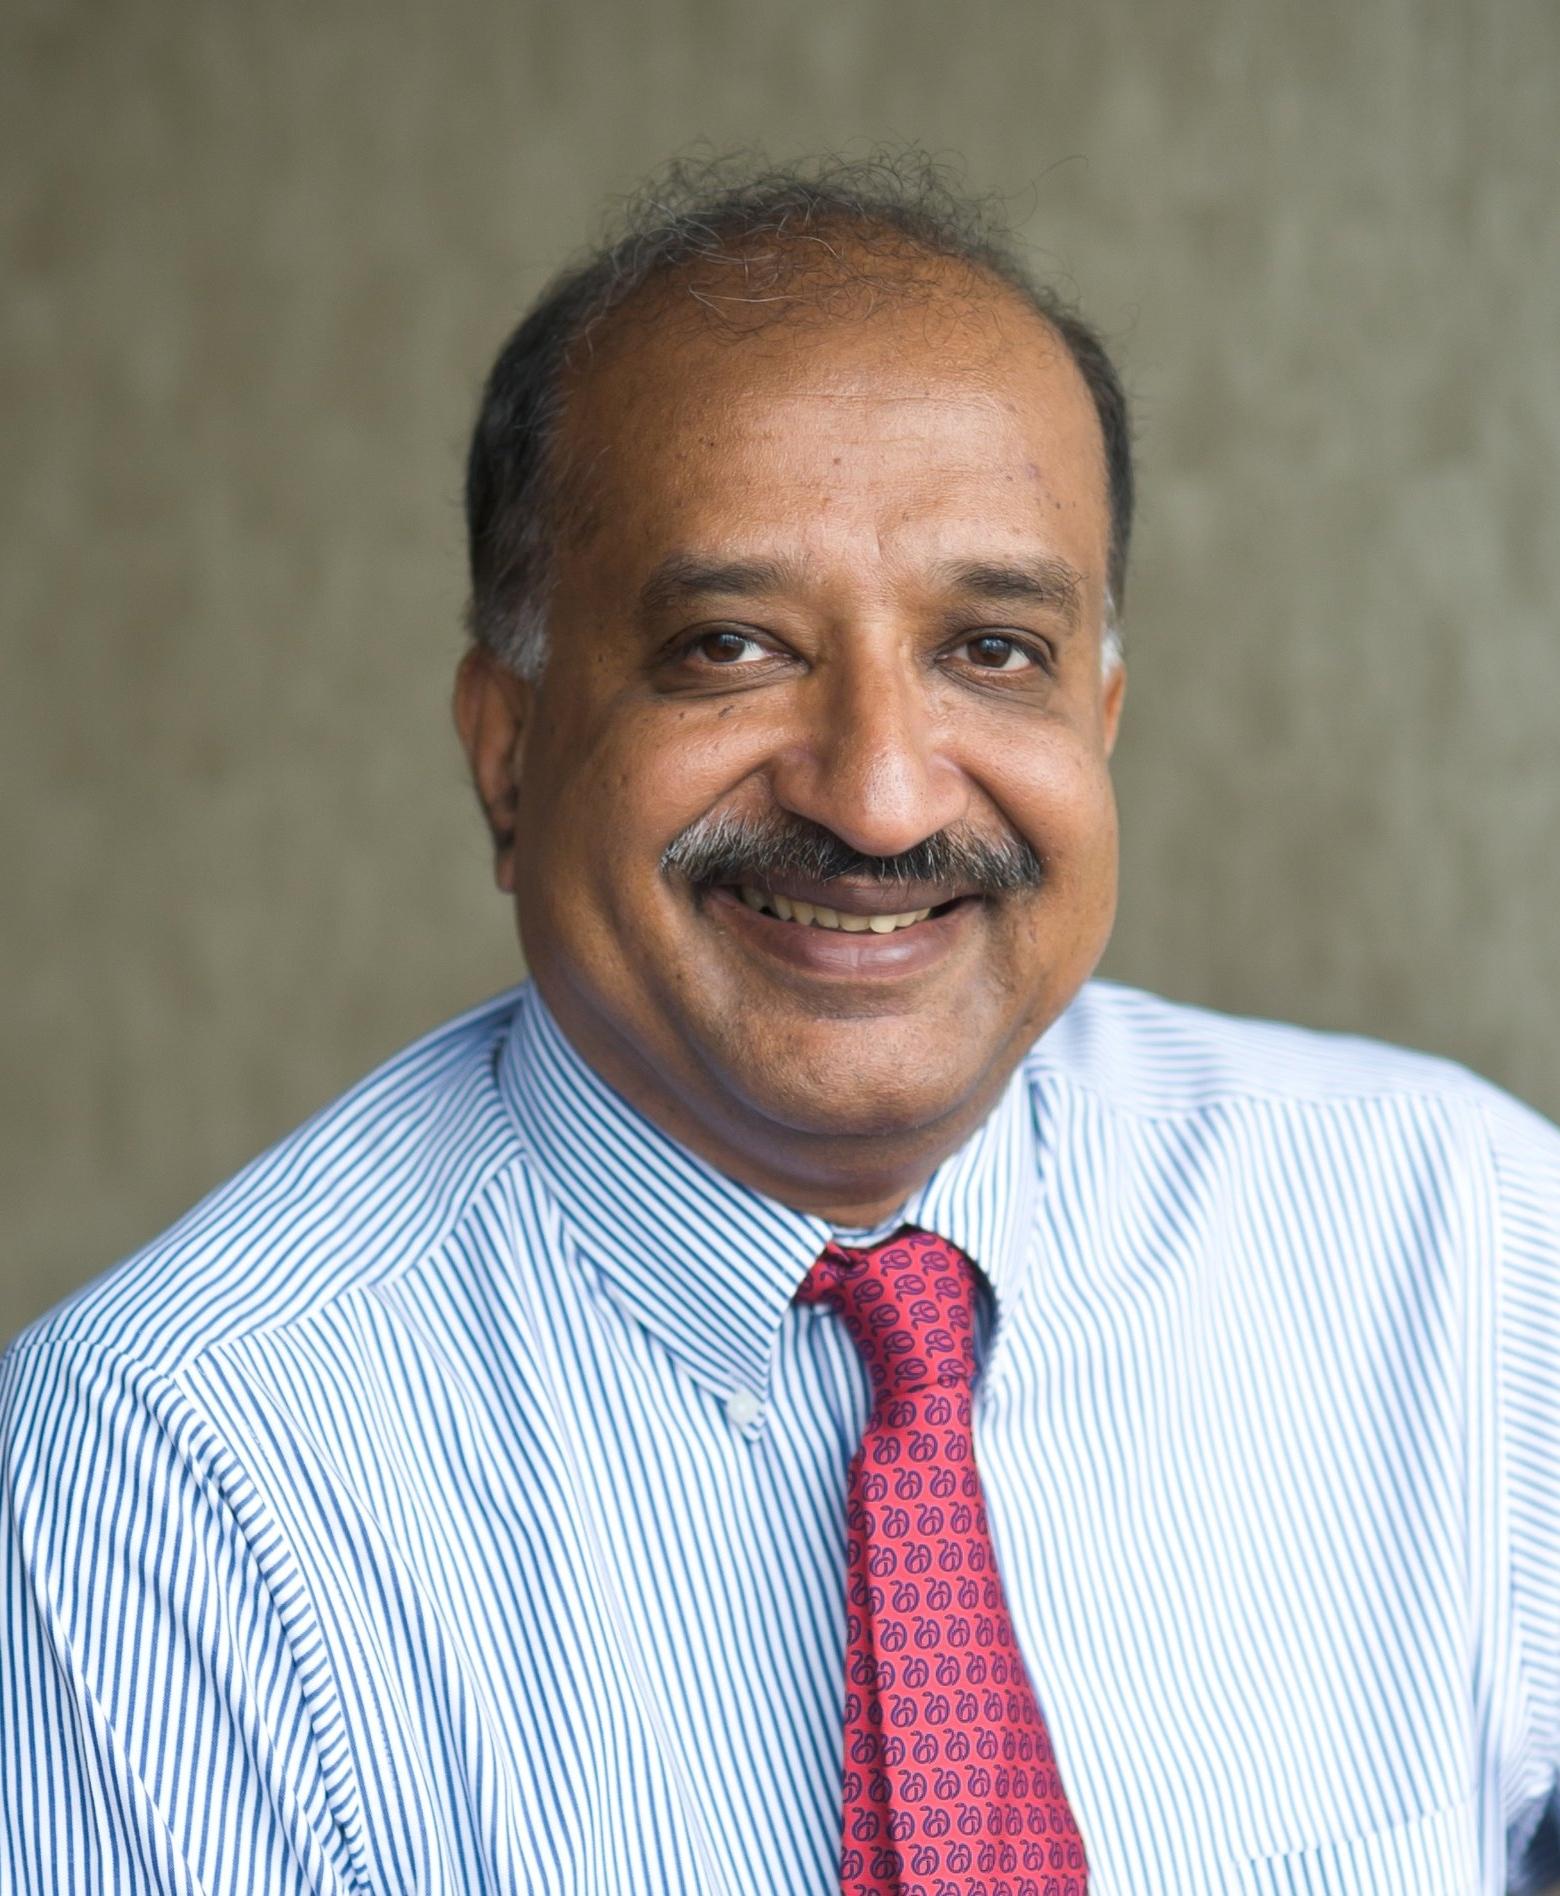 K. Ranga Krishnan, MB, ChB